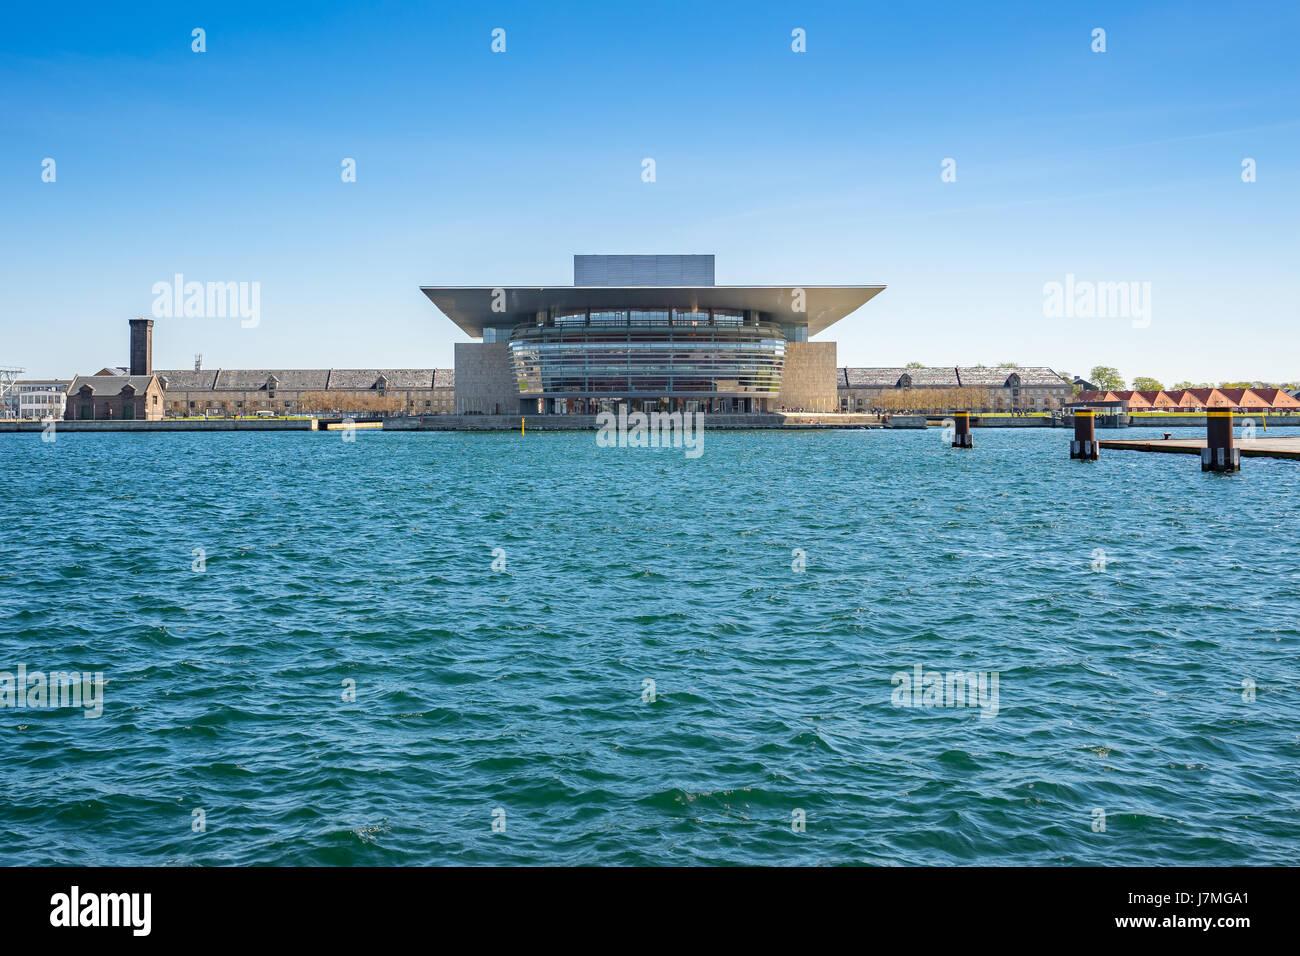 Opera house of Copengagen in Denmark. - Stock Image